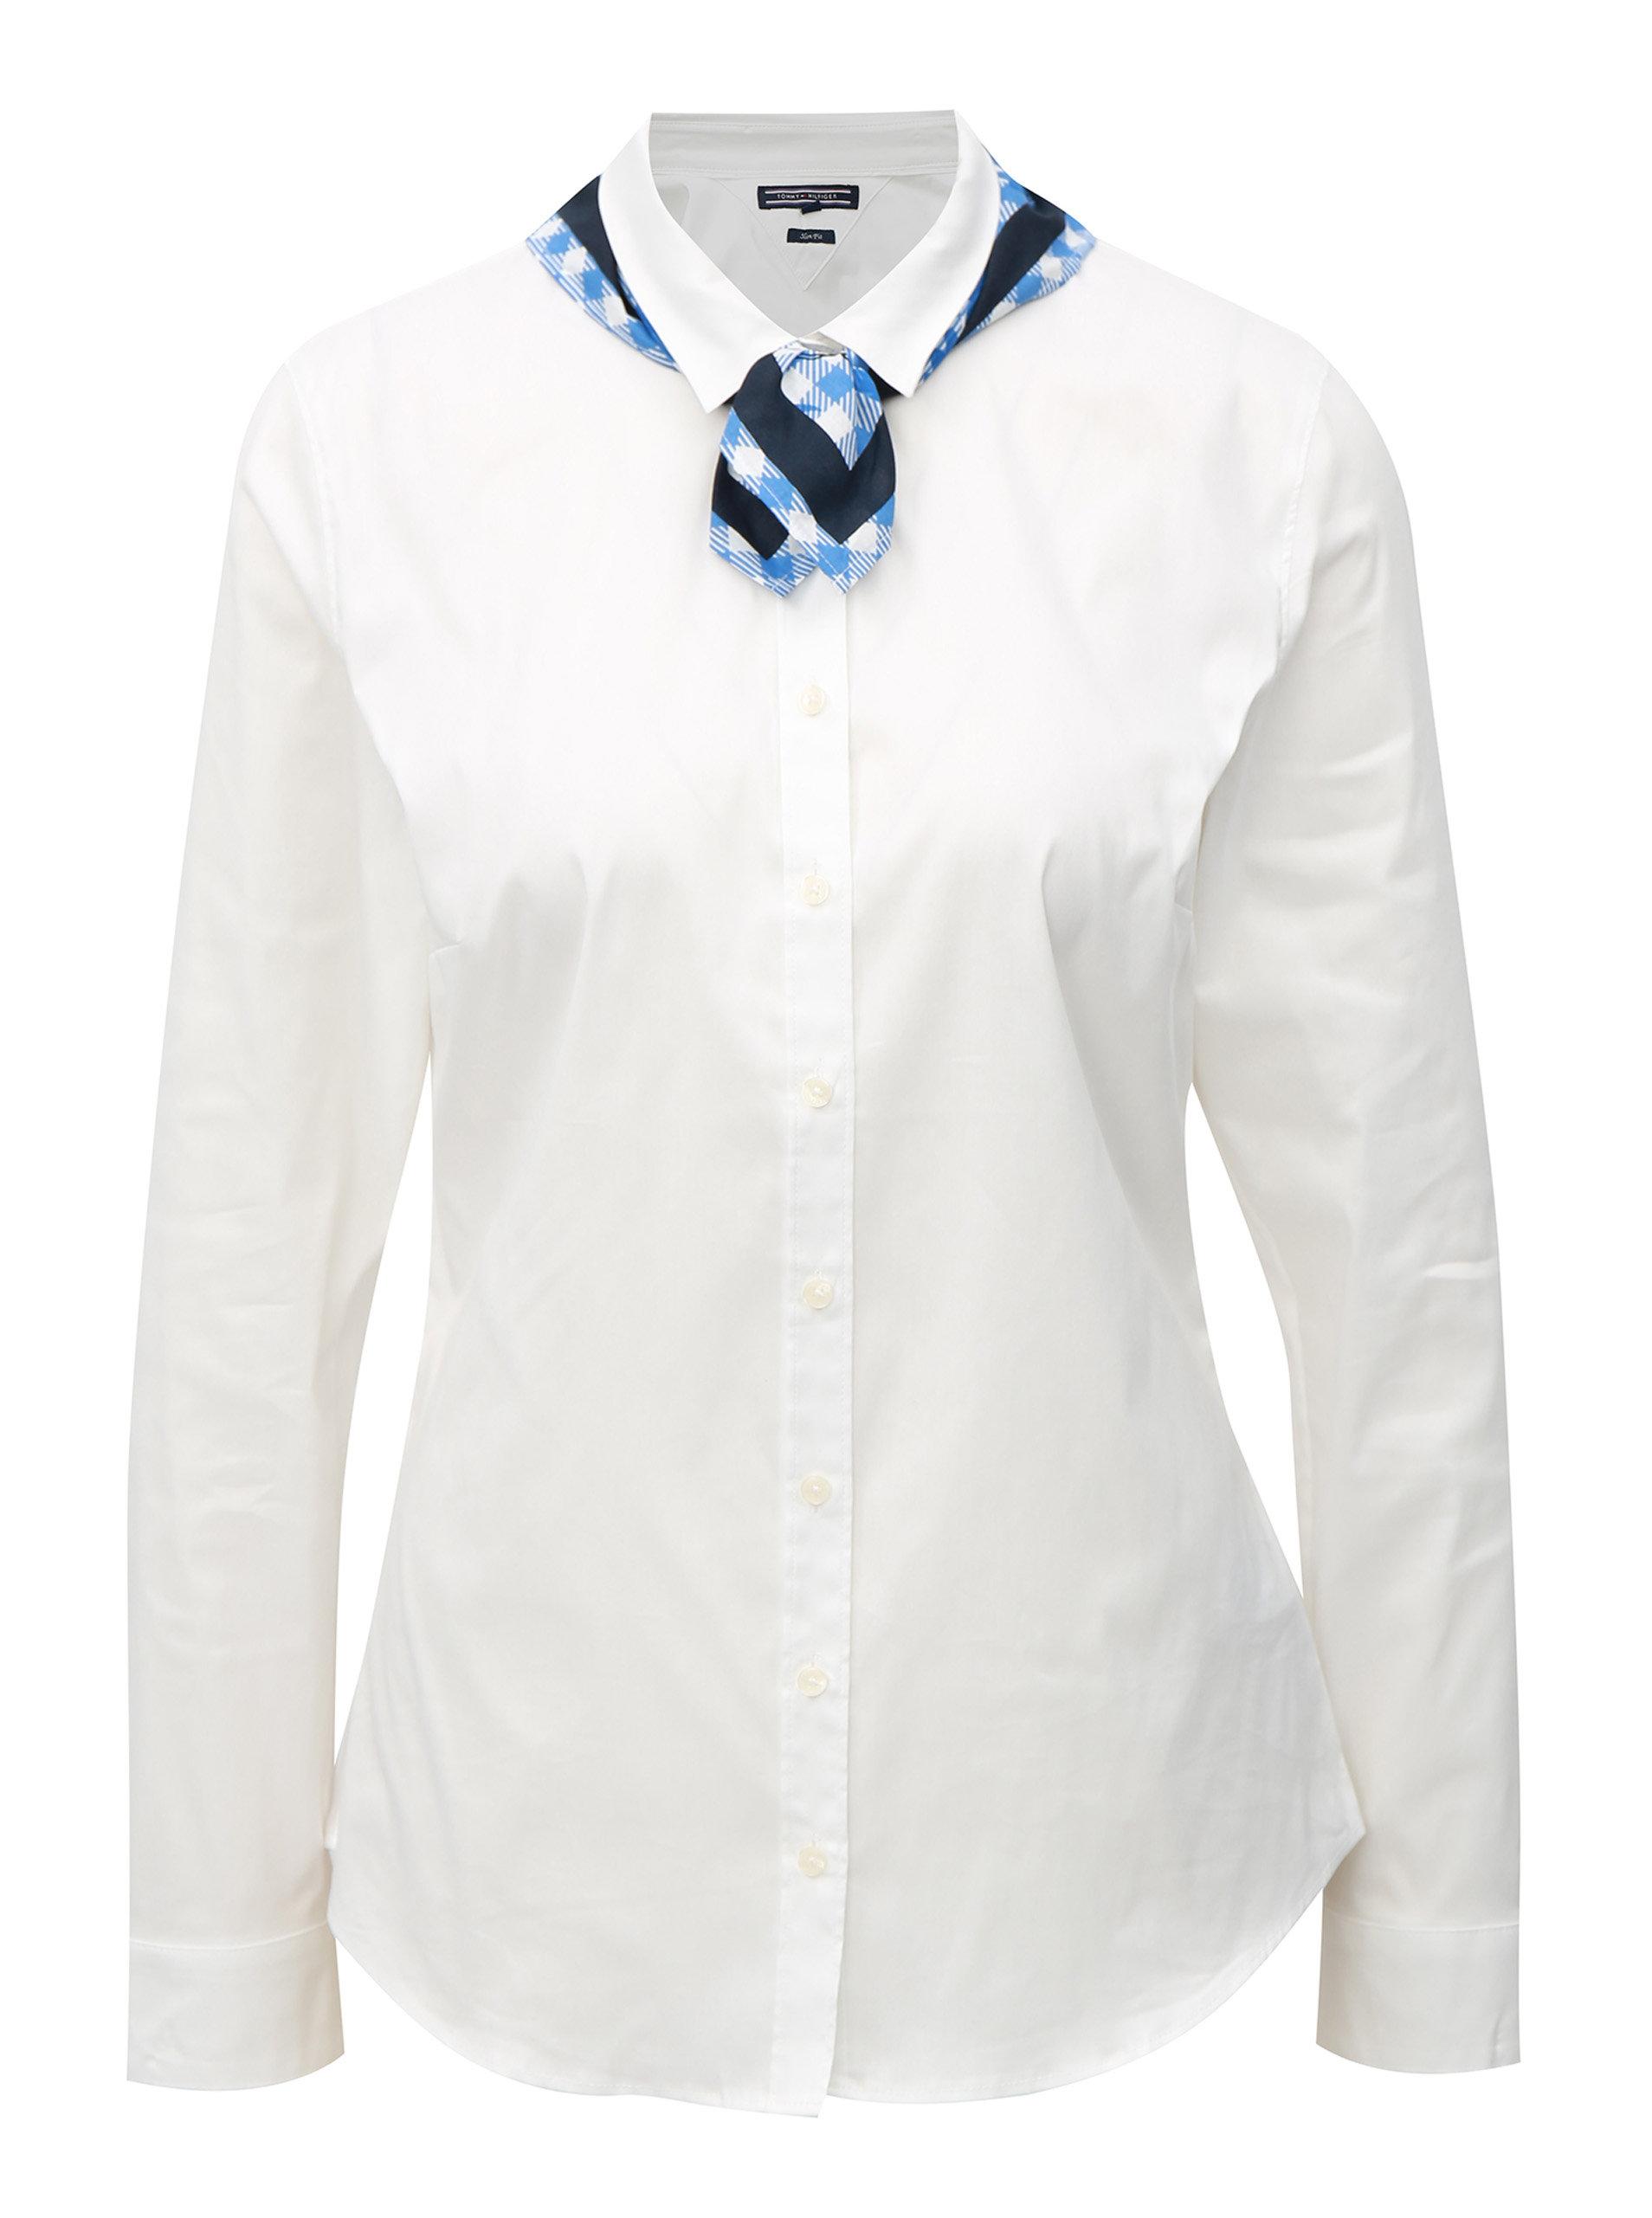 Biela dámska slim fit košeľa s dvoma šatkami Tommy Hilfiger ... de474242a6c